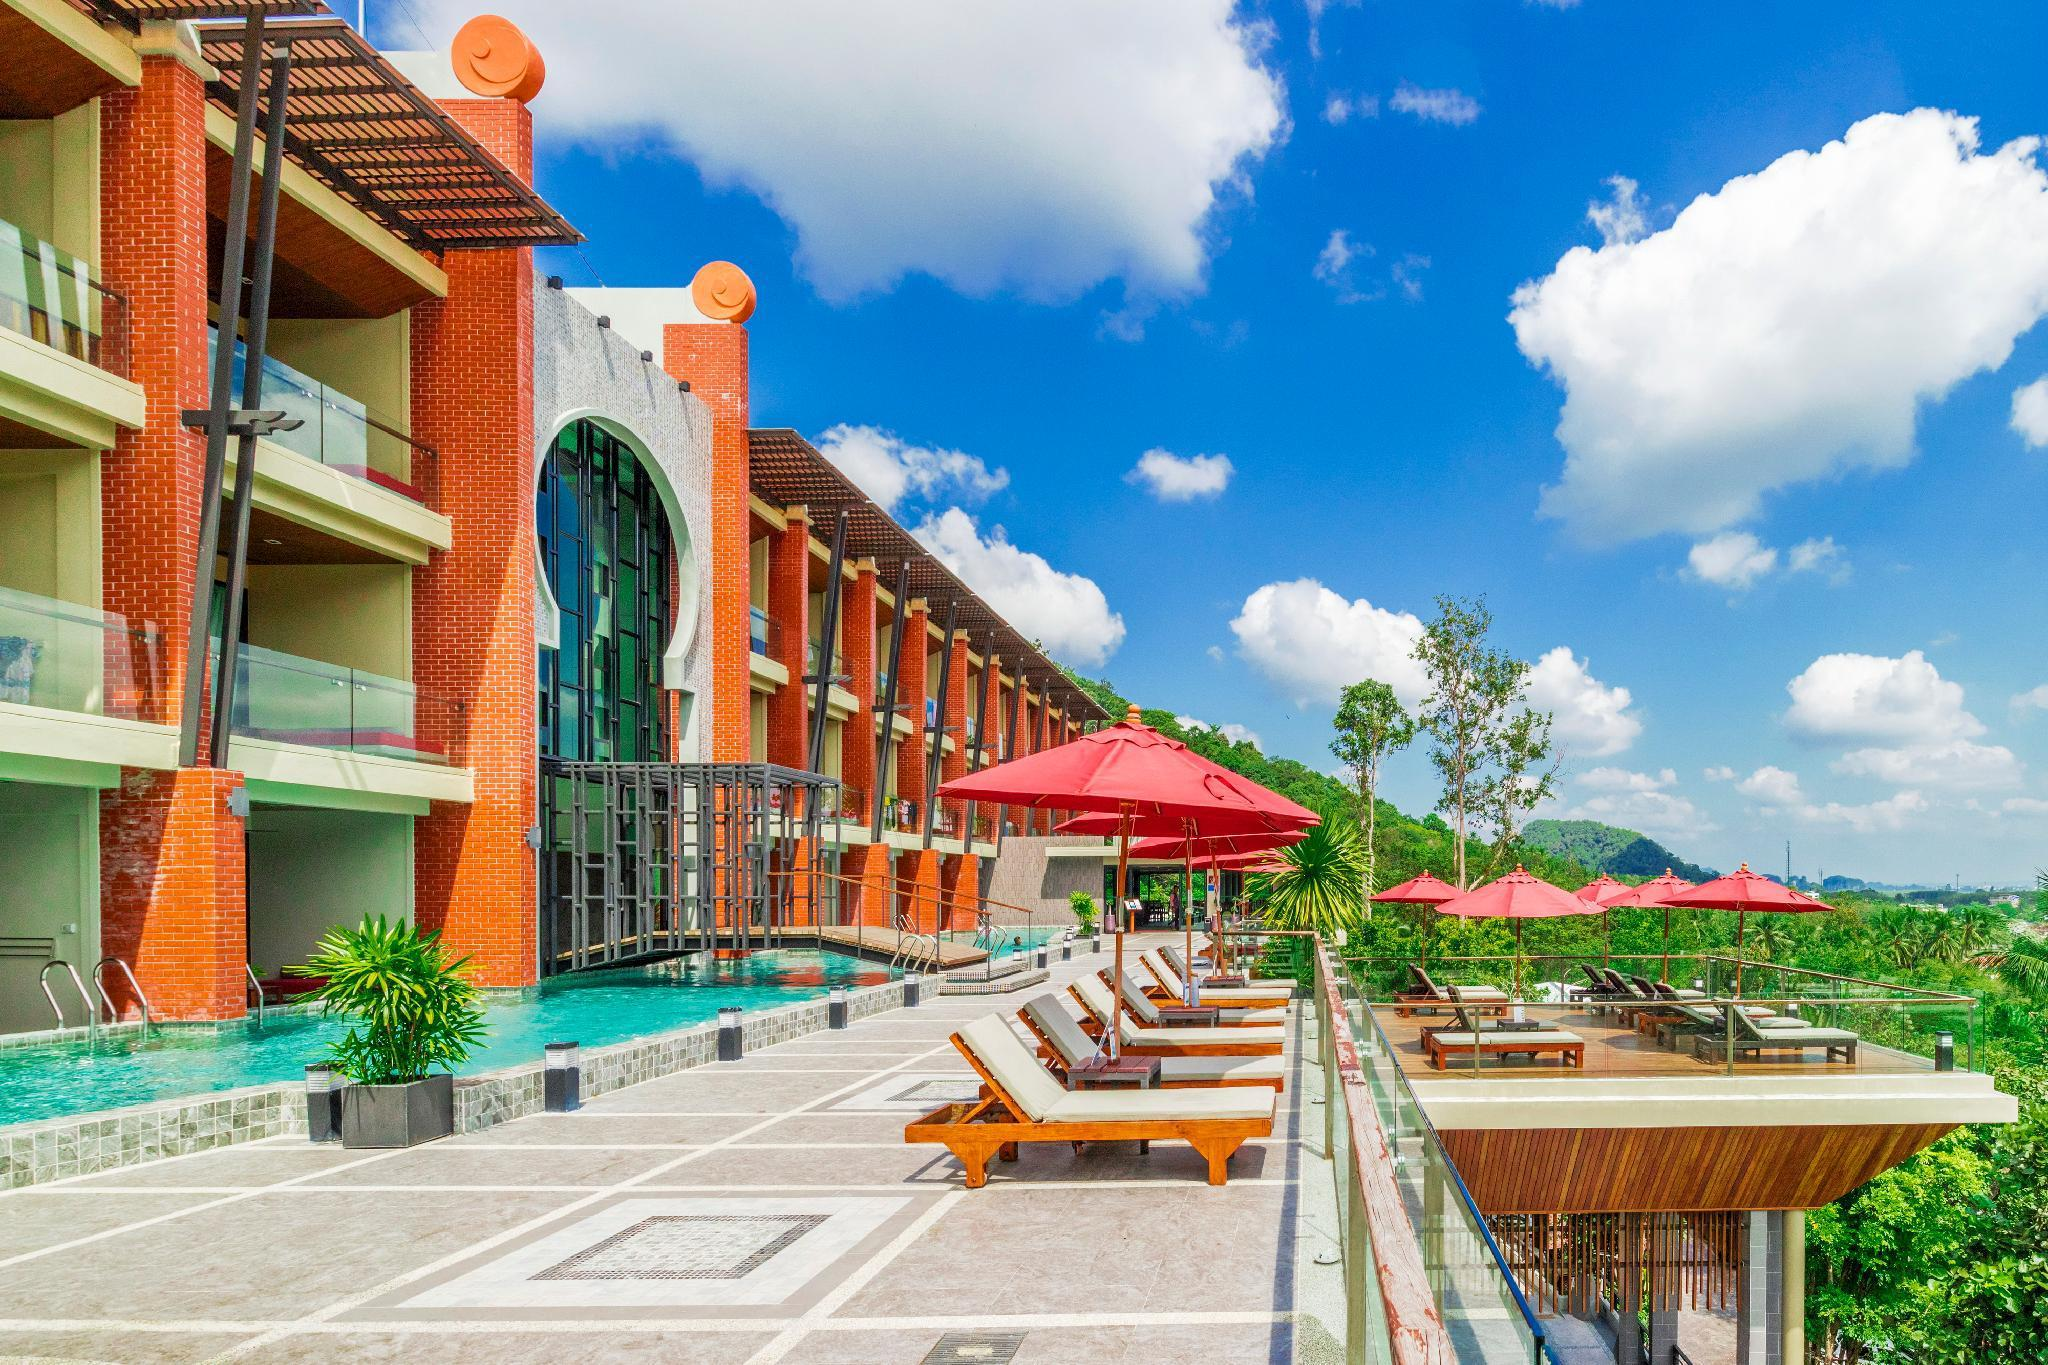 Aonang Phu Pi Maan Resort and Spa อ่าวนาง ภูพิมาน รีสอร์ต แอนด์ สปา